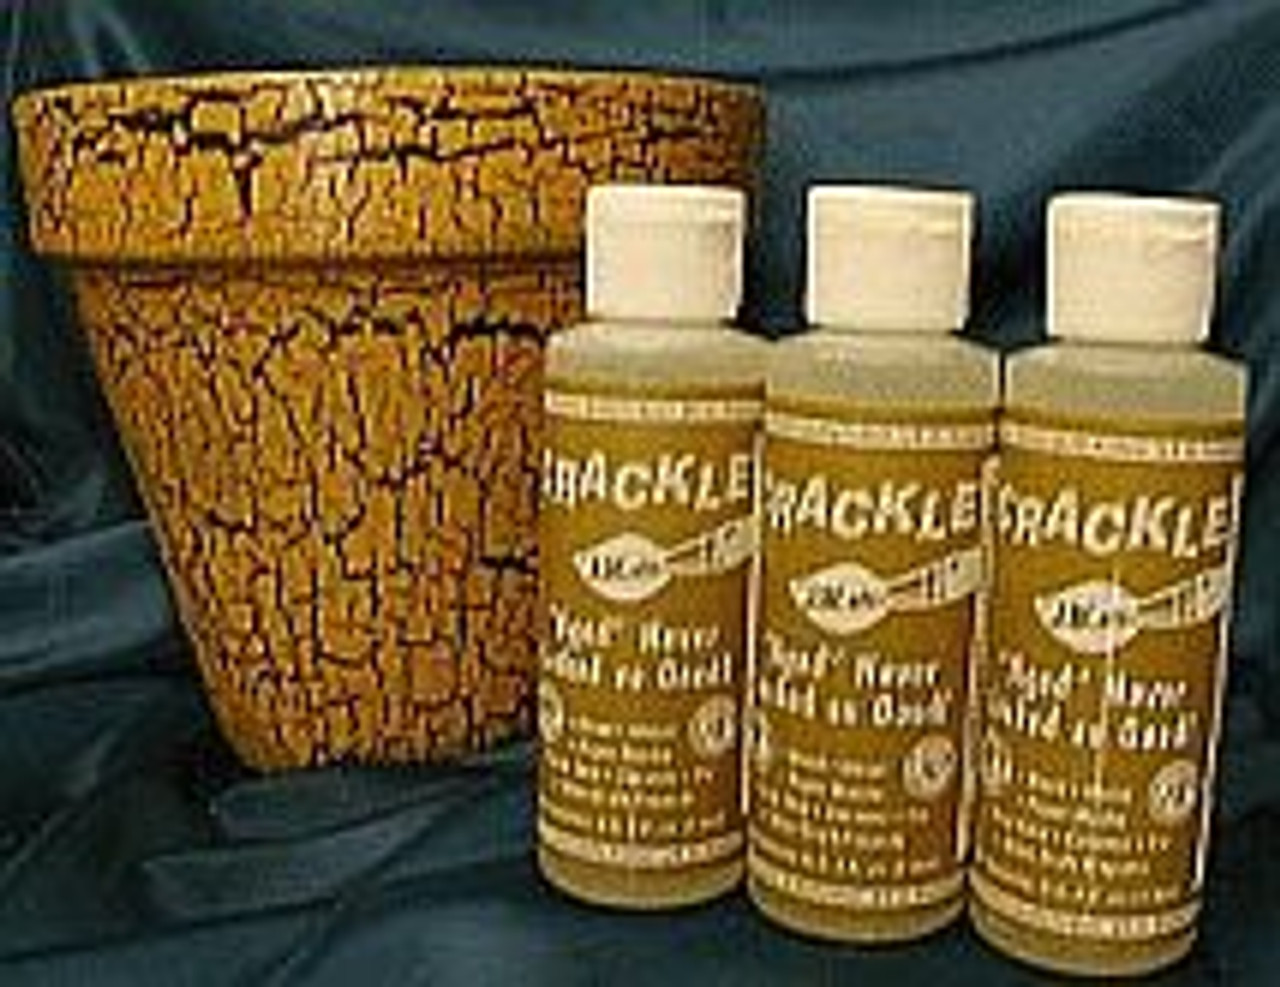 J.W. etc.'s Crackle